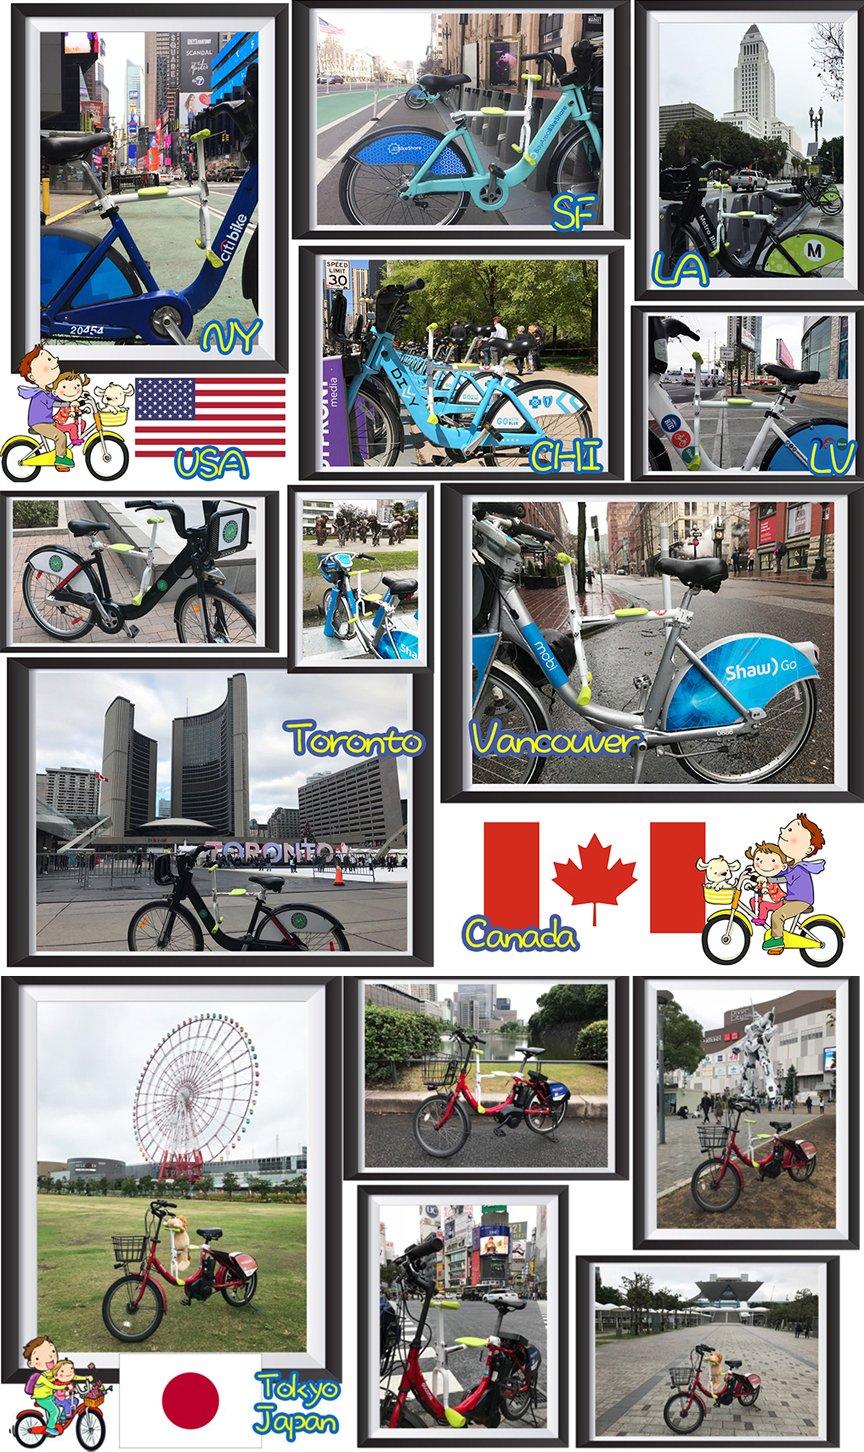 PaPaSeat Portable Light Weight Fast Install Child Bike Seat, Works with All City Bikes (USA, Canada, Paris, Milan, Warsaw, Tokyo, Taipei…) by PaPaSeat (Image #4)